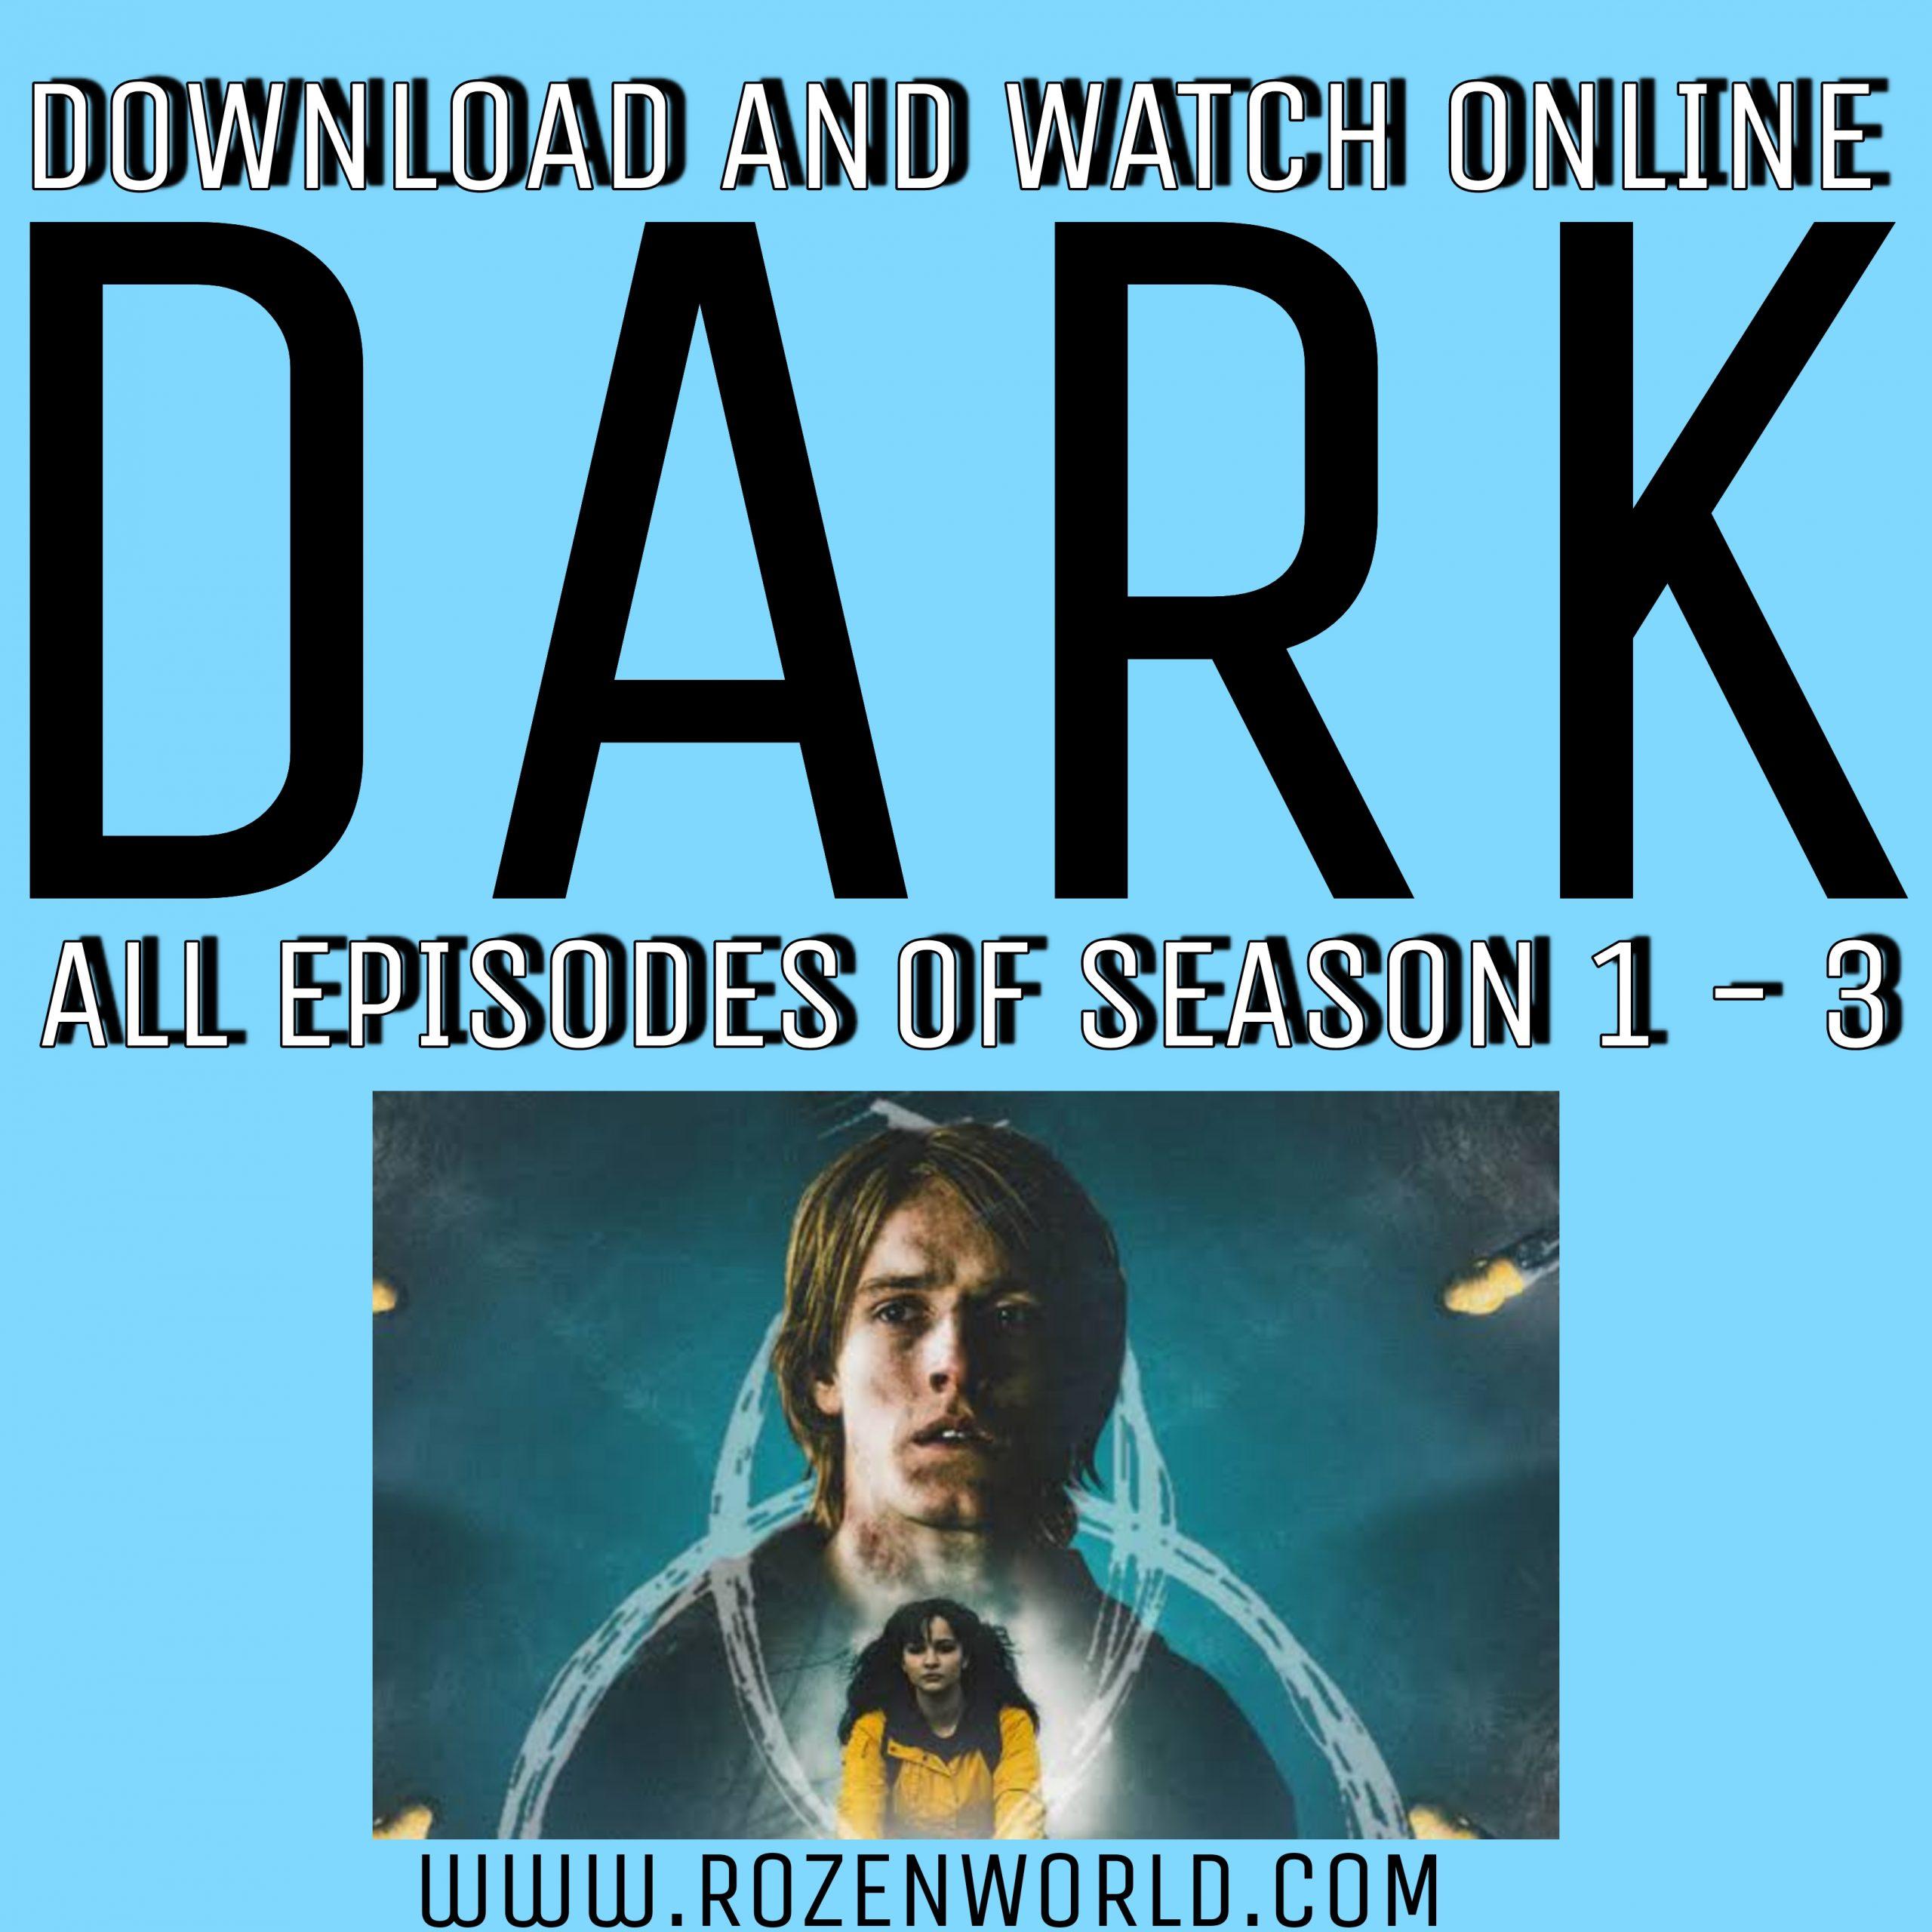 Dark Web Series Download Telegram All Episodes of Season 1-3